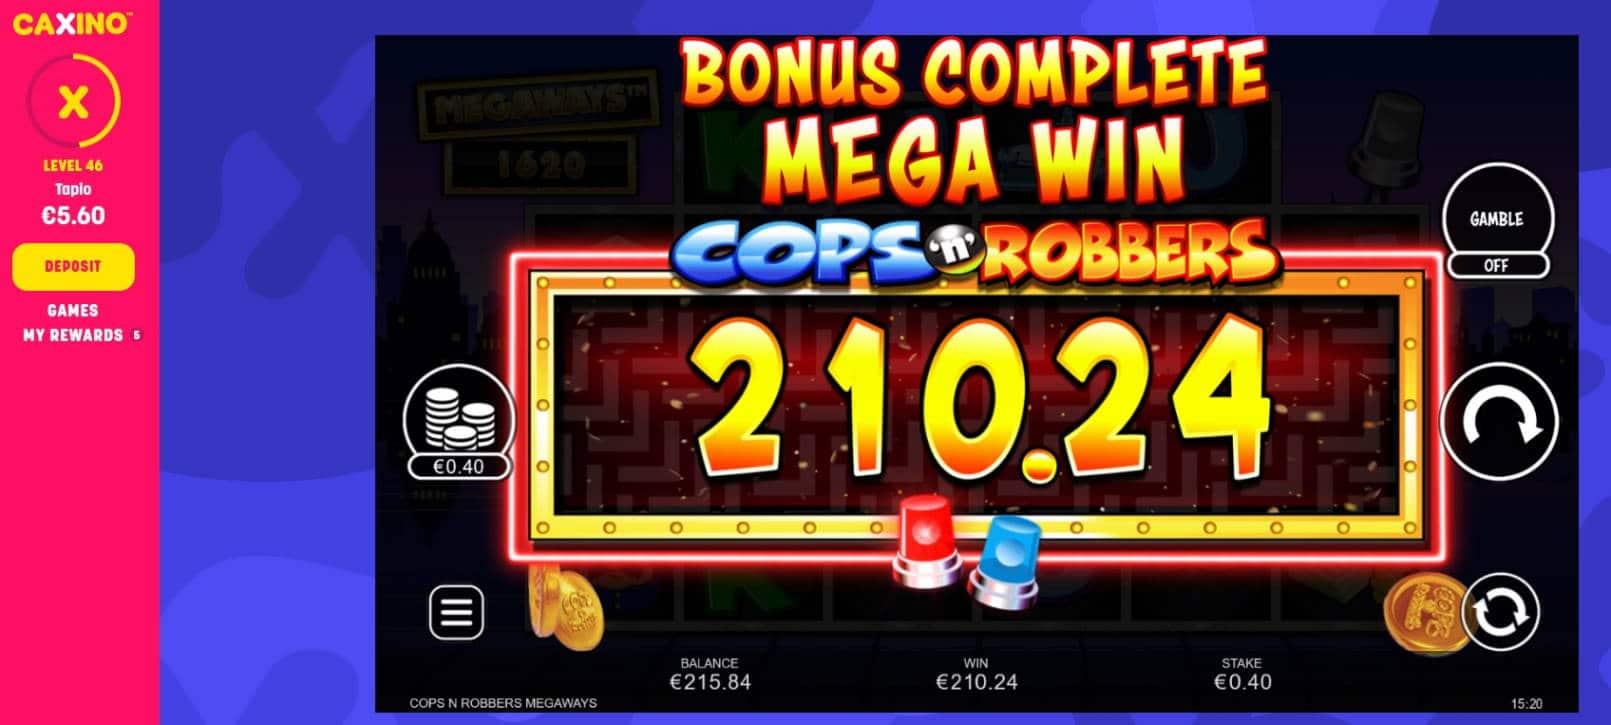 Cops_n Robbers Megaways Casino win picture by MrMork 13.5.2021 210.24e 526X